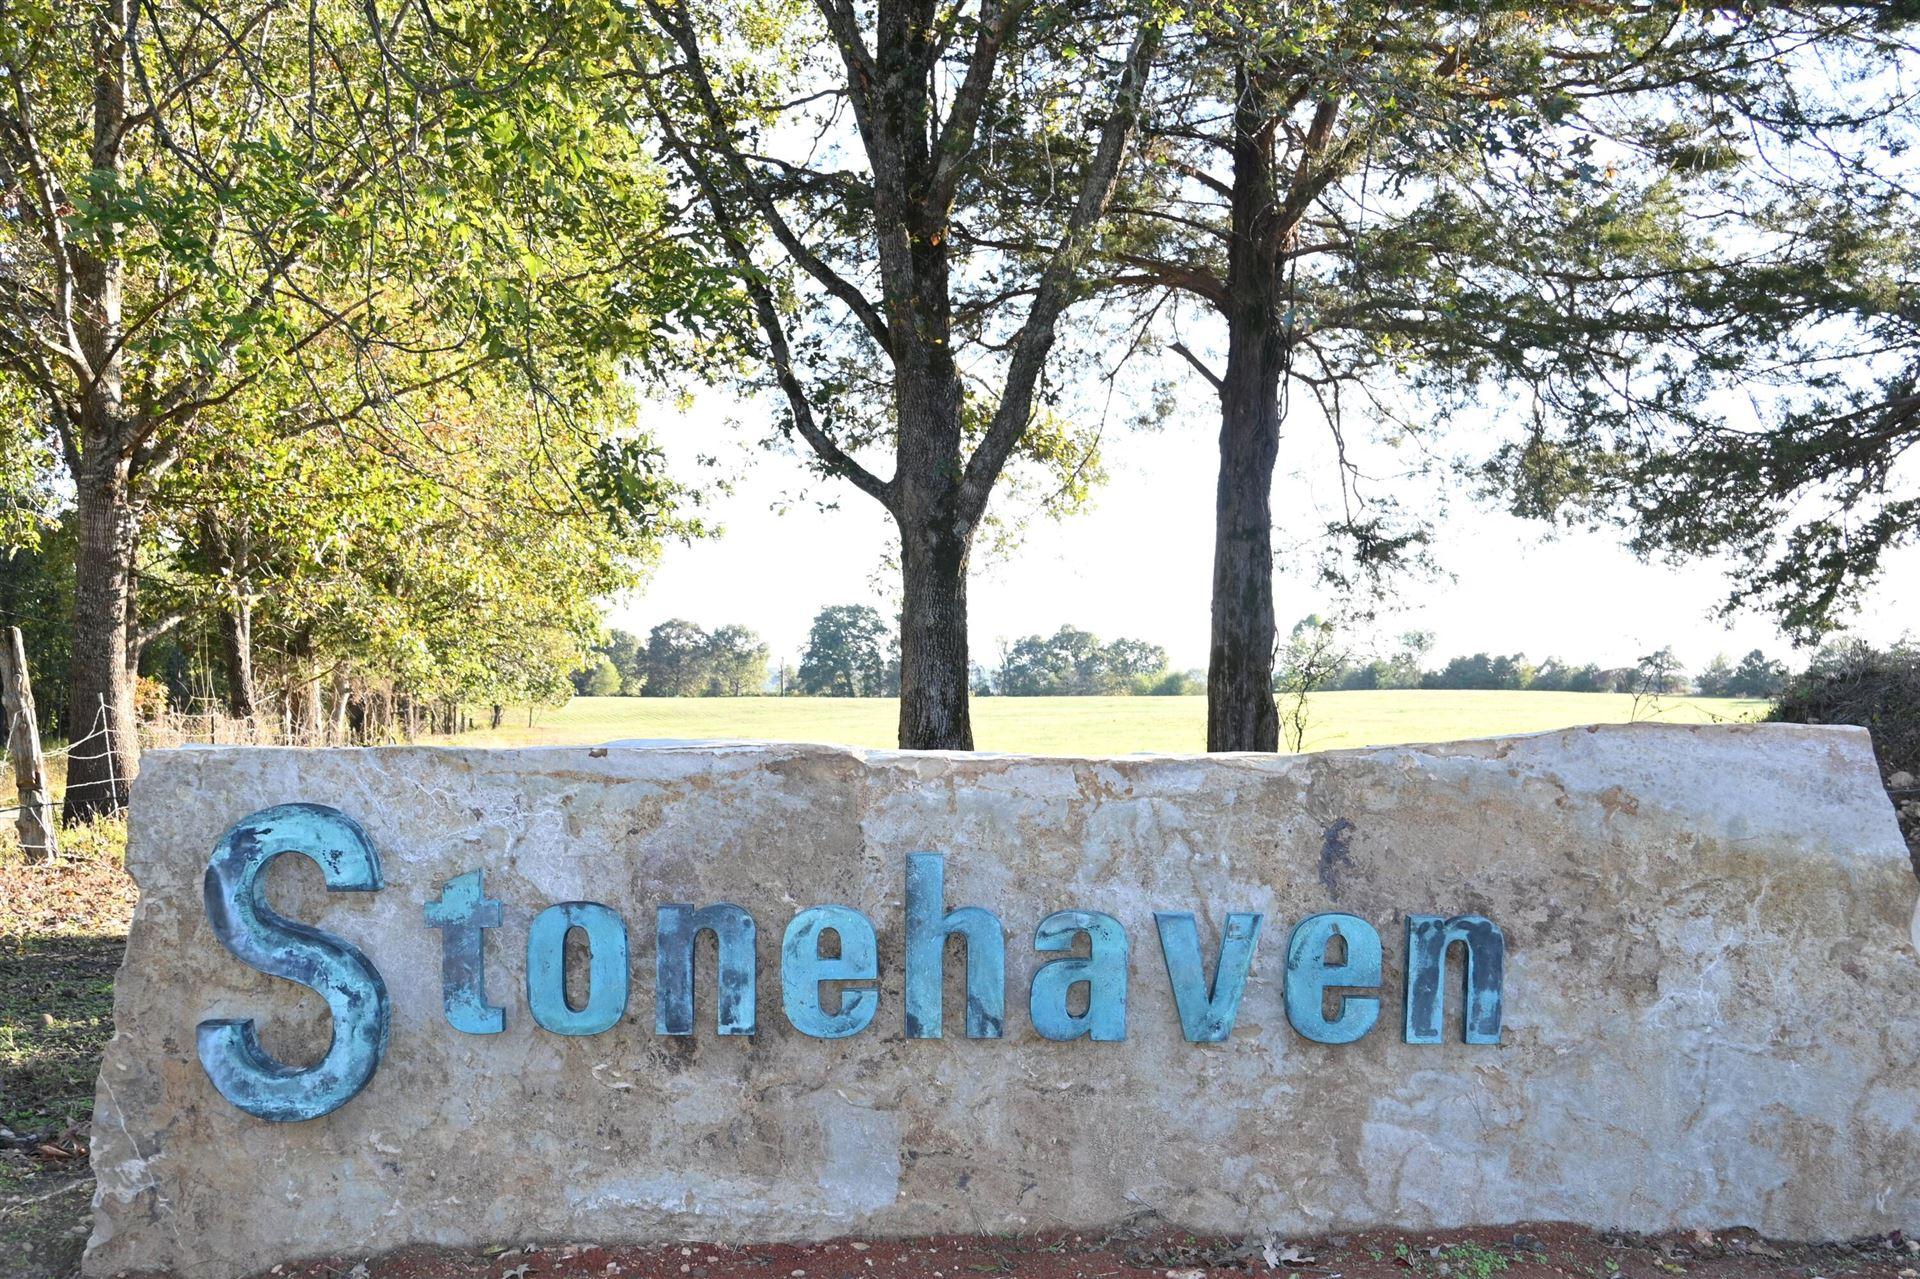 Photo of Lot 14 Stonehaven Way, Shell Knob, MO 65747 (MLS # 60203686)